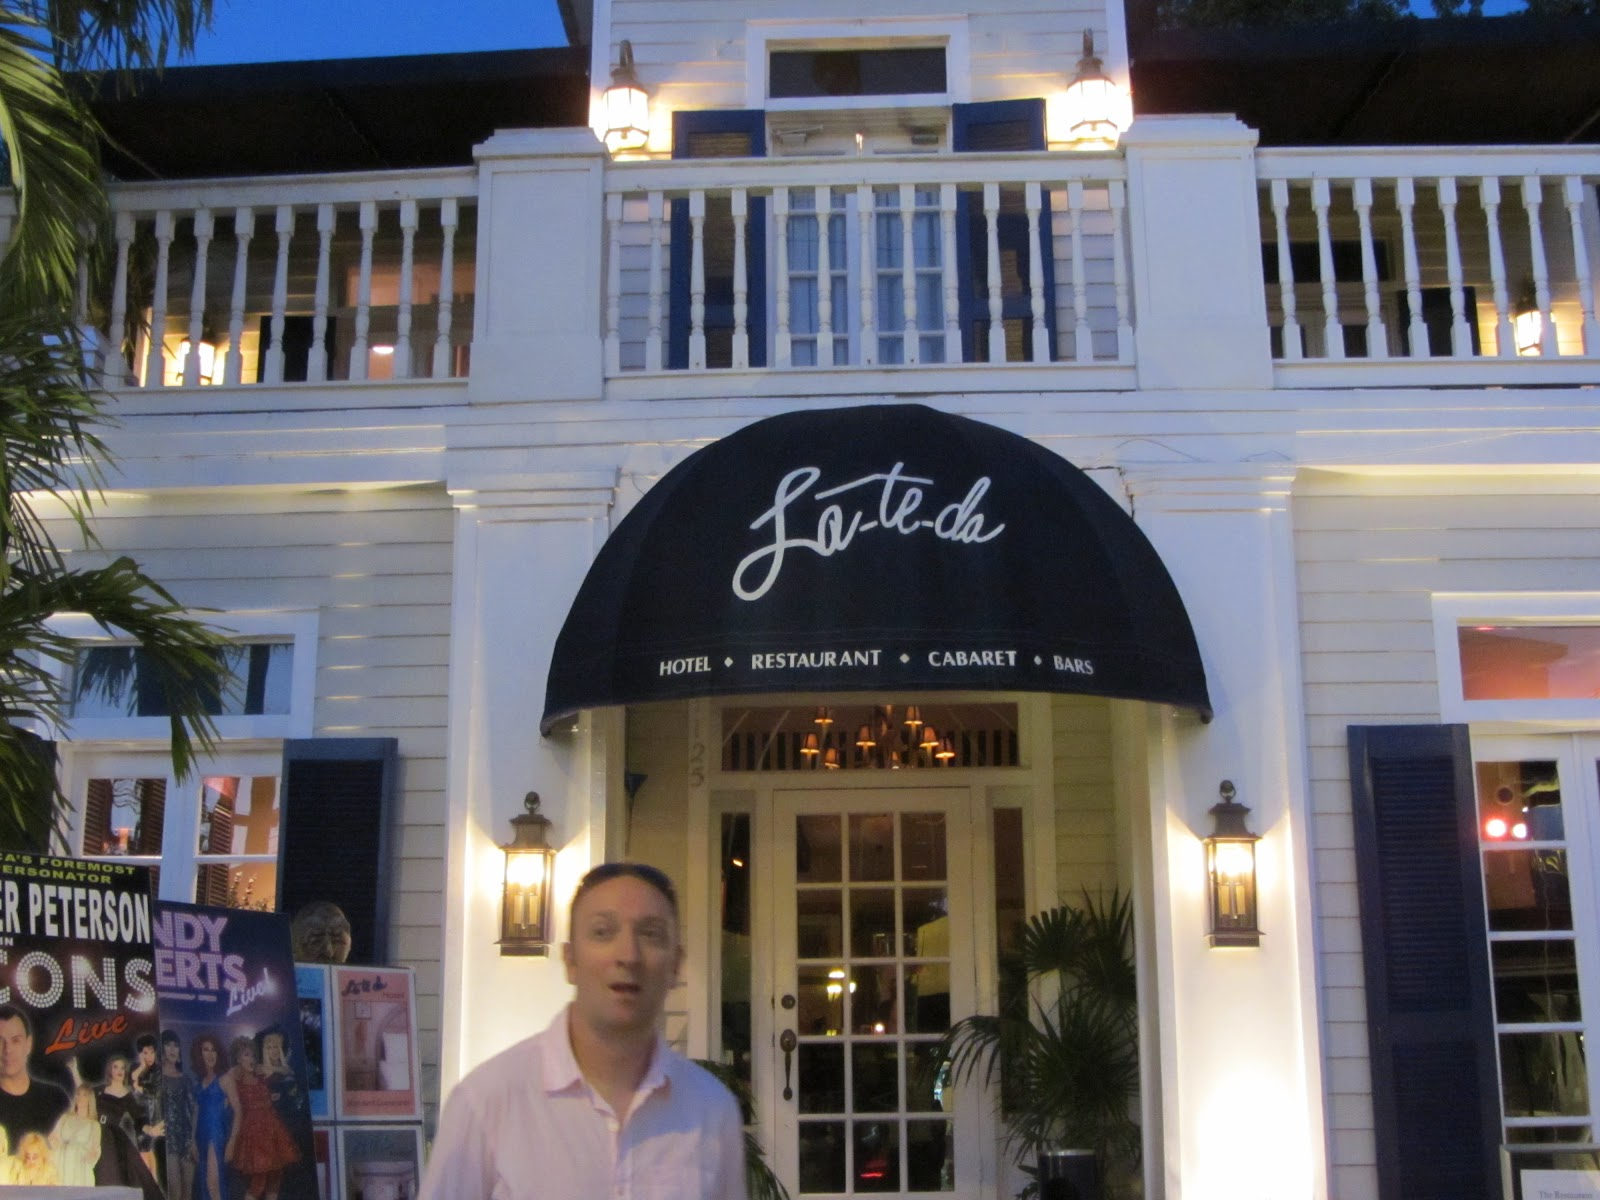 La Te Da Is Also A Restaurant And Hotel It S Historic Fine Looking Building